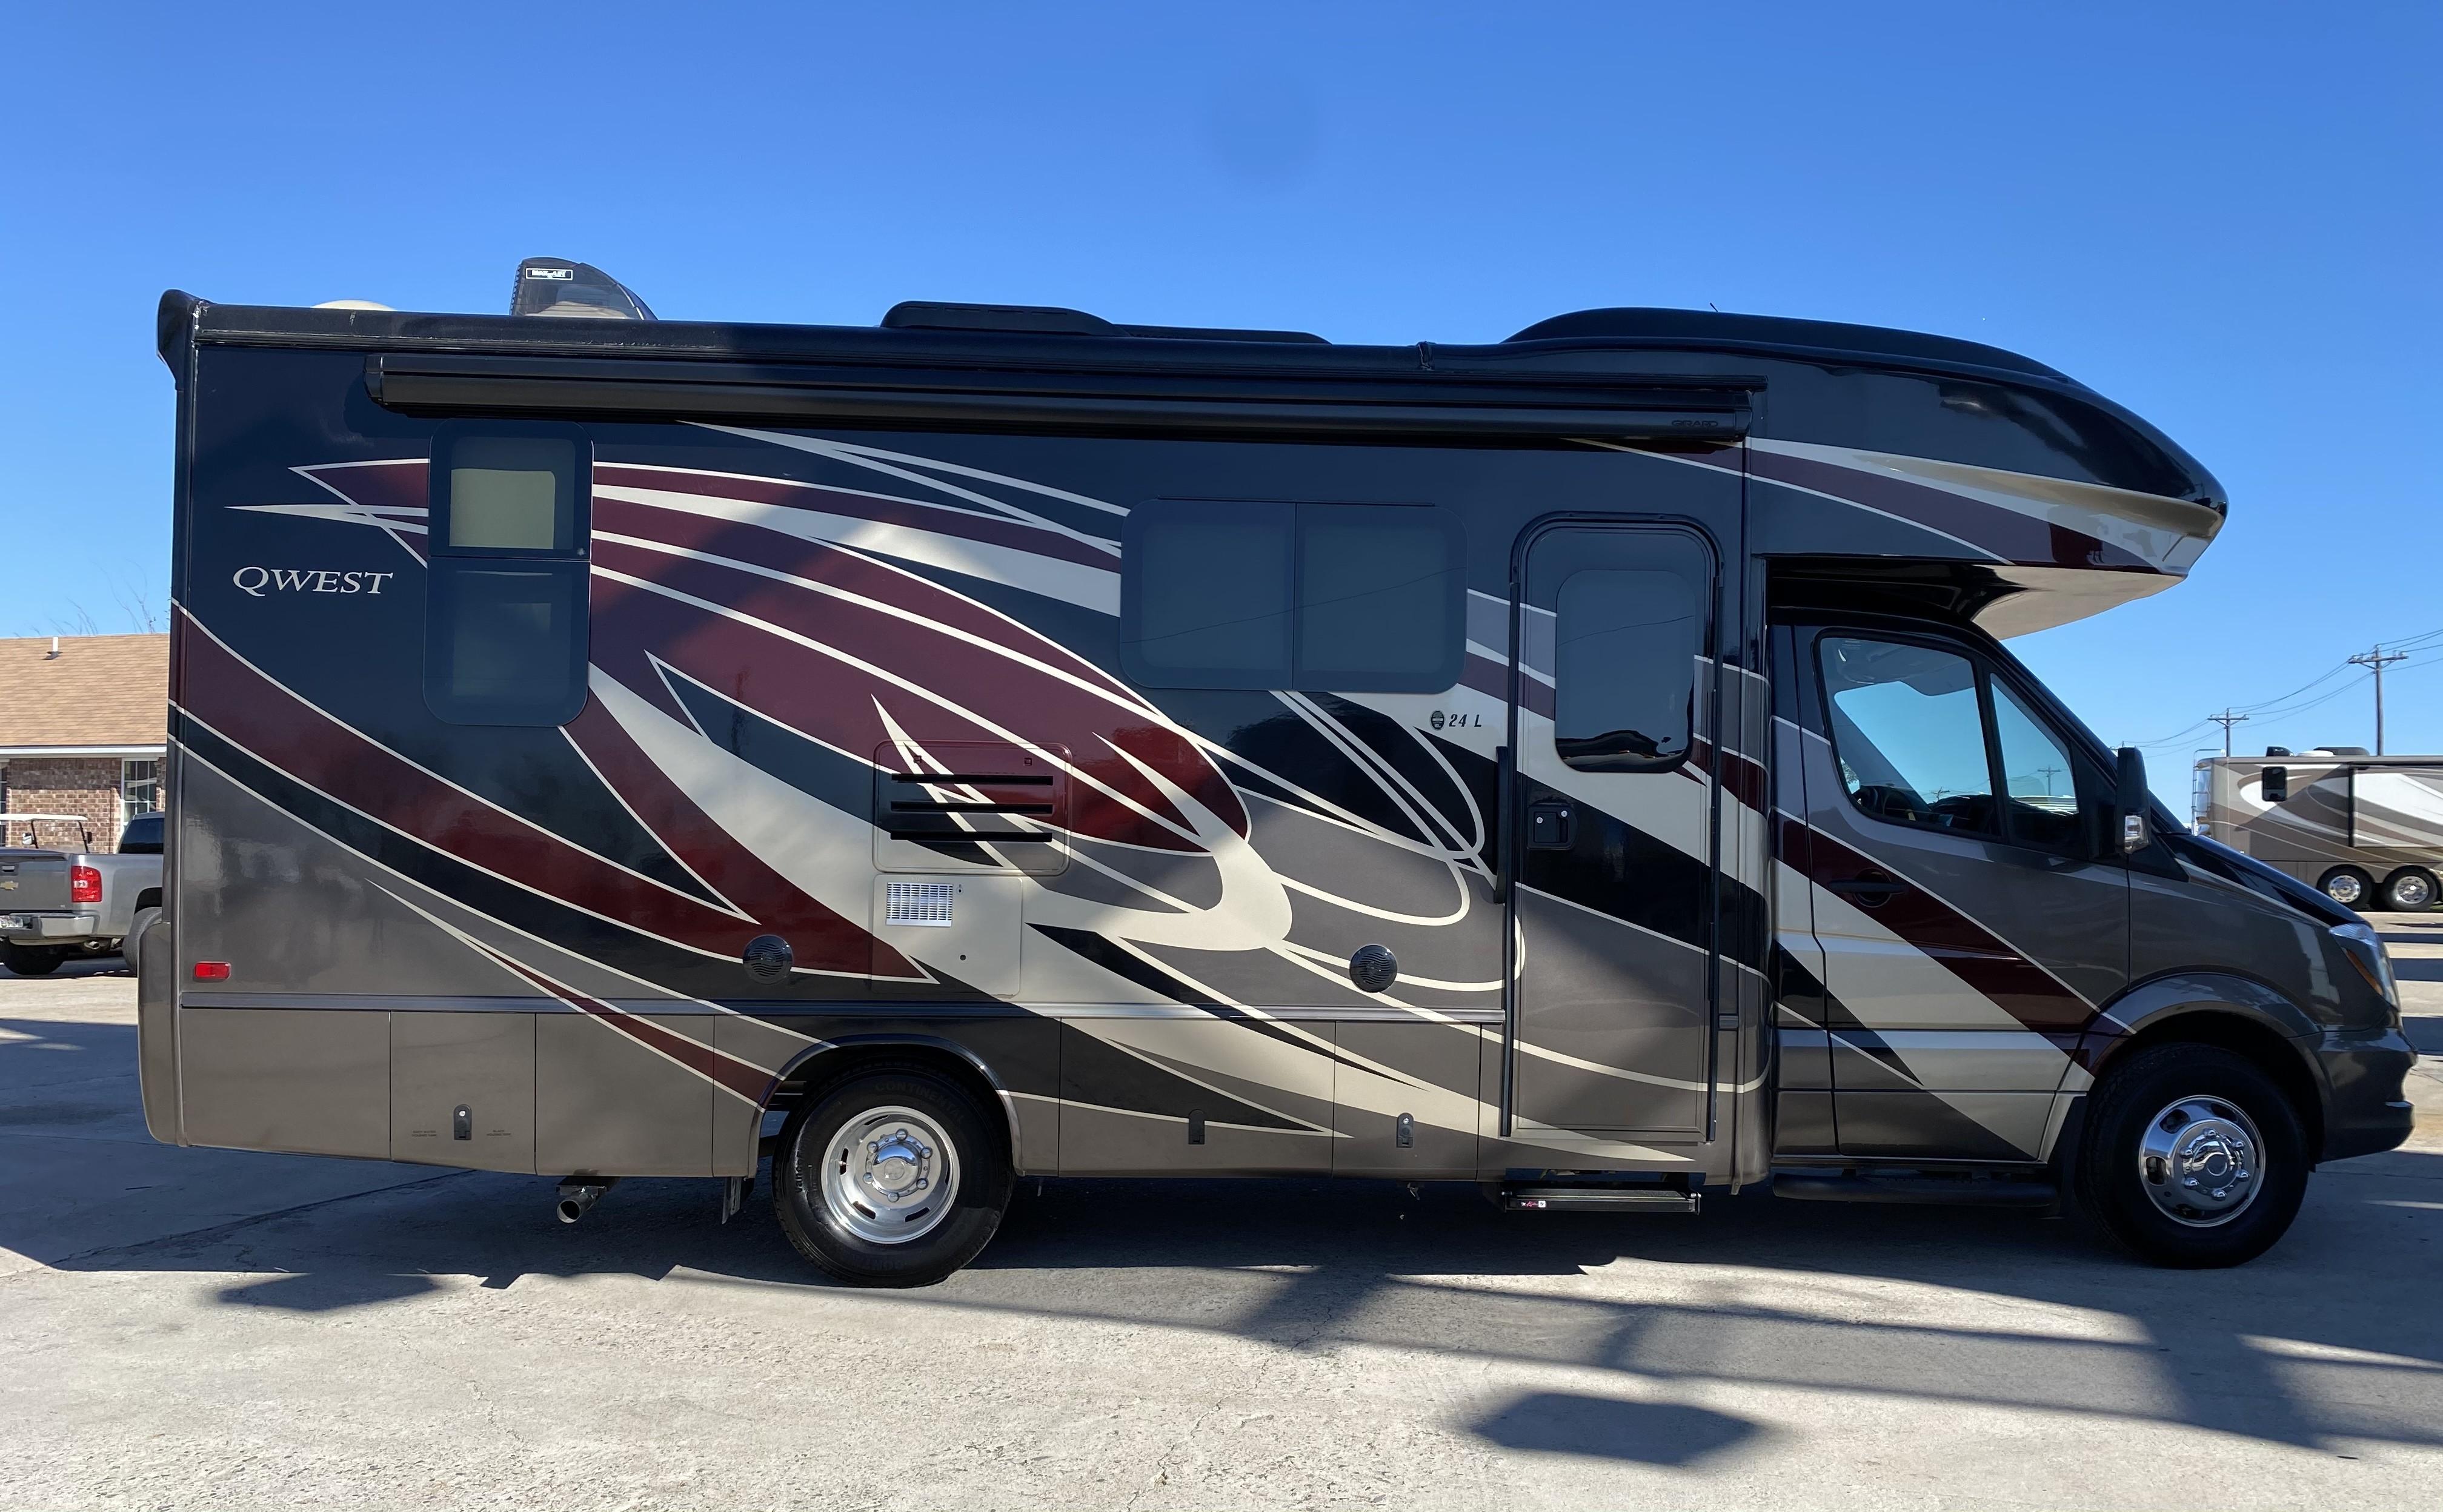 Used 2019 Entegra Coach Mercedes-Benz QWEST 24L in Royse City, TX